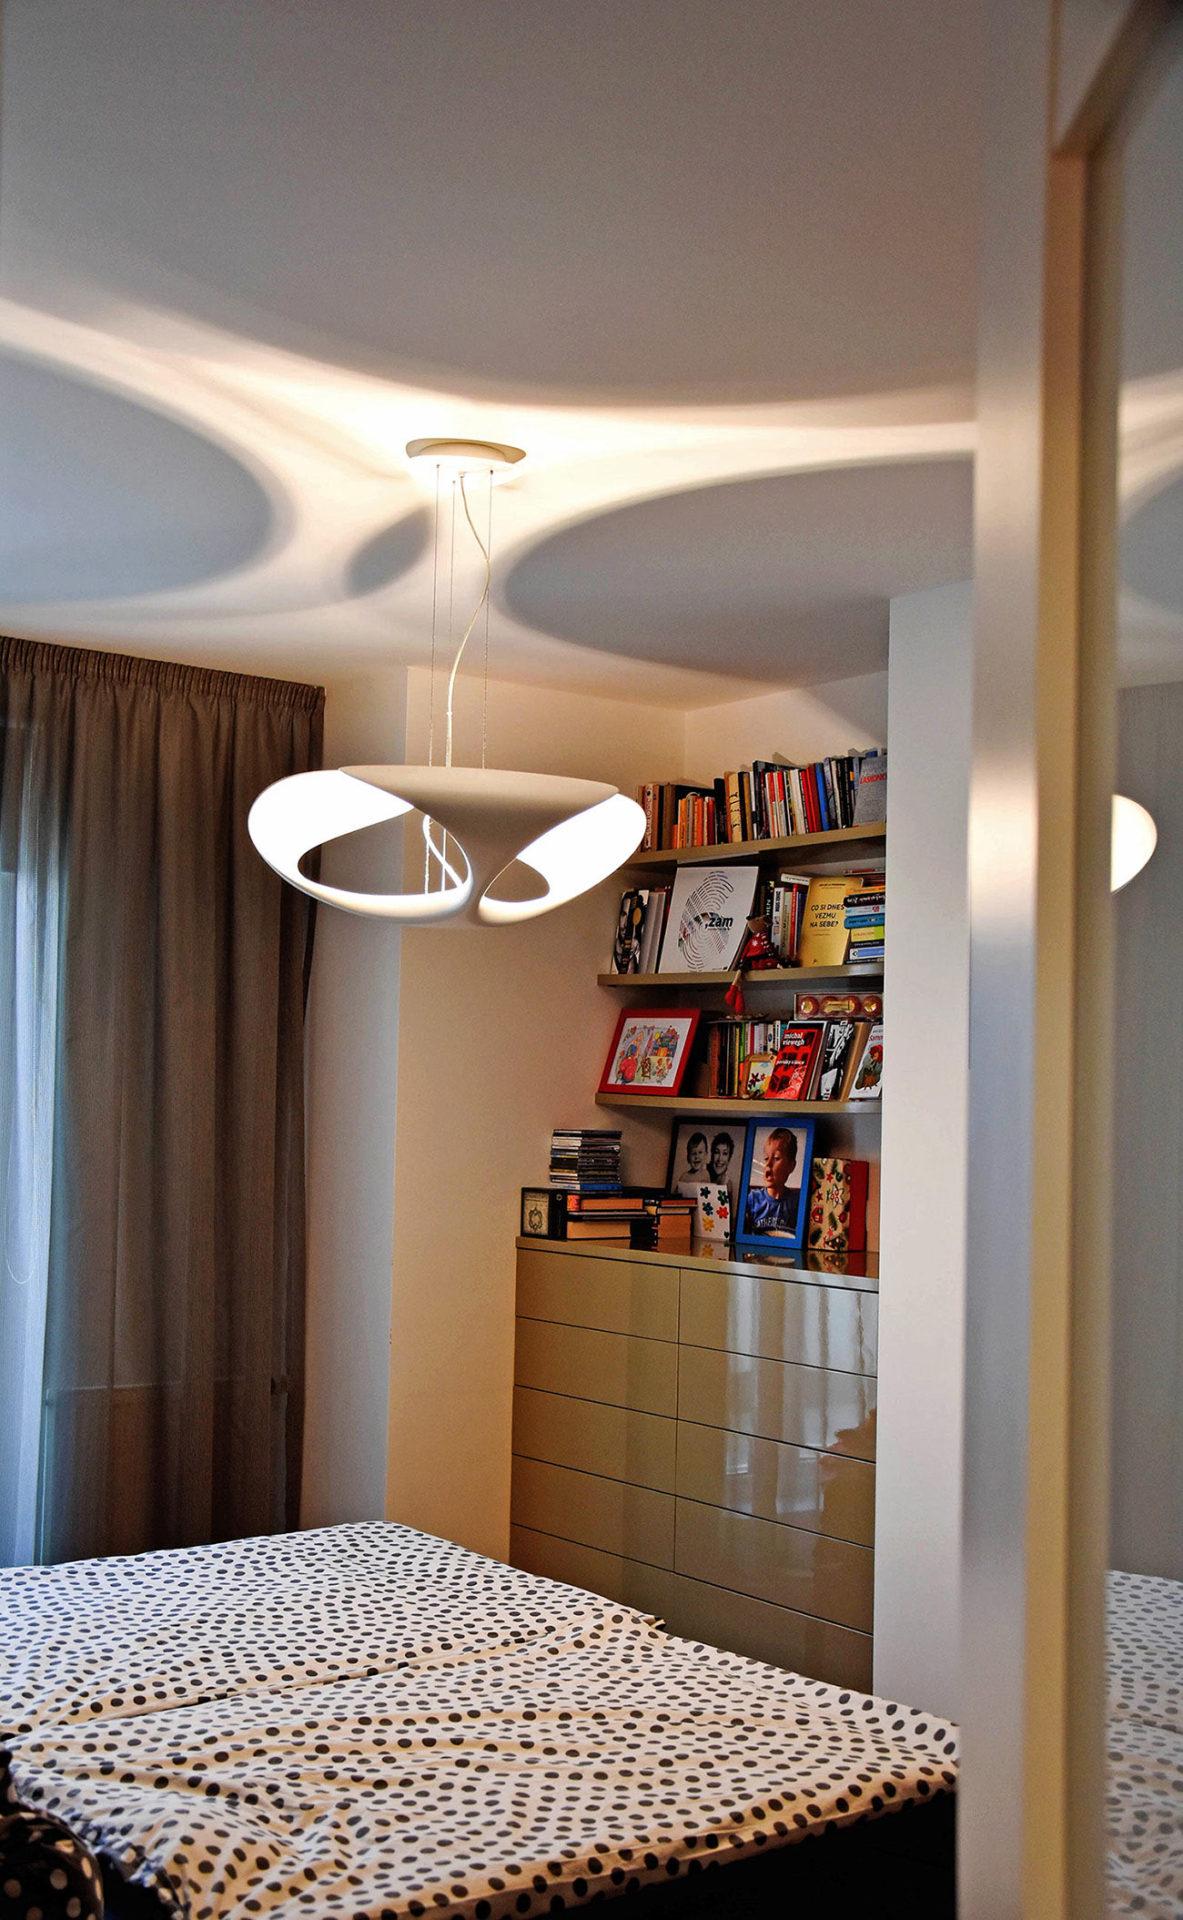 Pohled do ložnice a světlo Clover-Hagos.